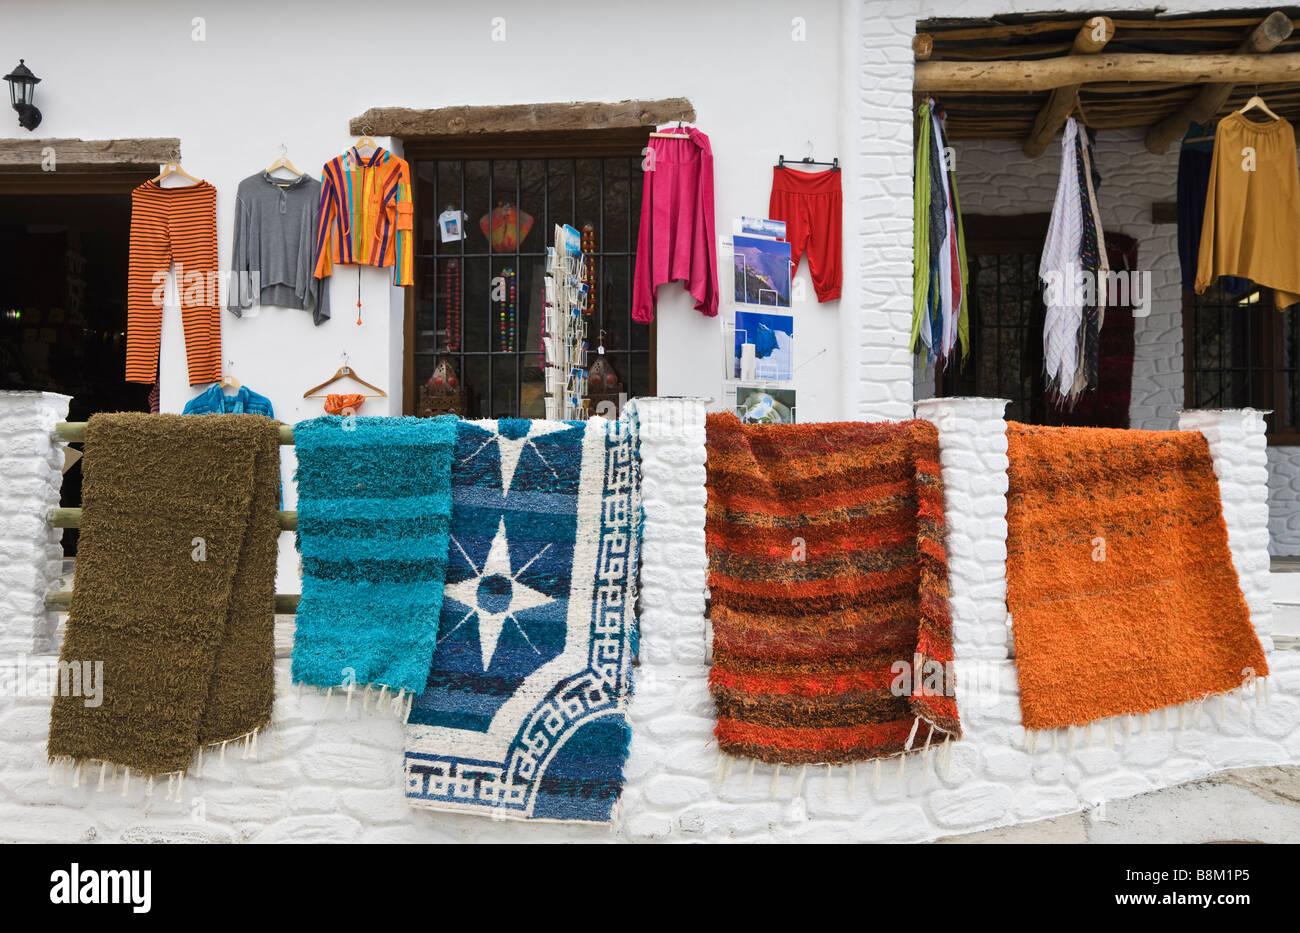 Capileira La Alpujarra Granada Province Spain Jarapas or typical Alpujarran rugs for sale - Stock Image